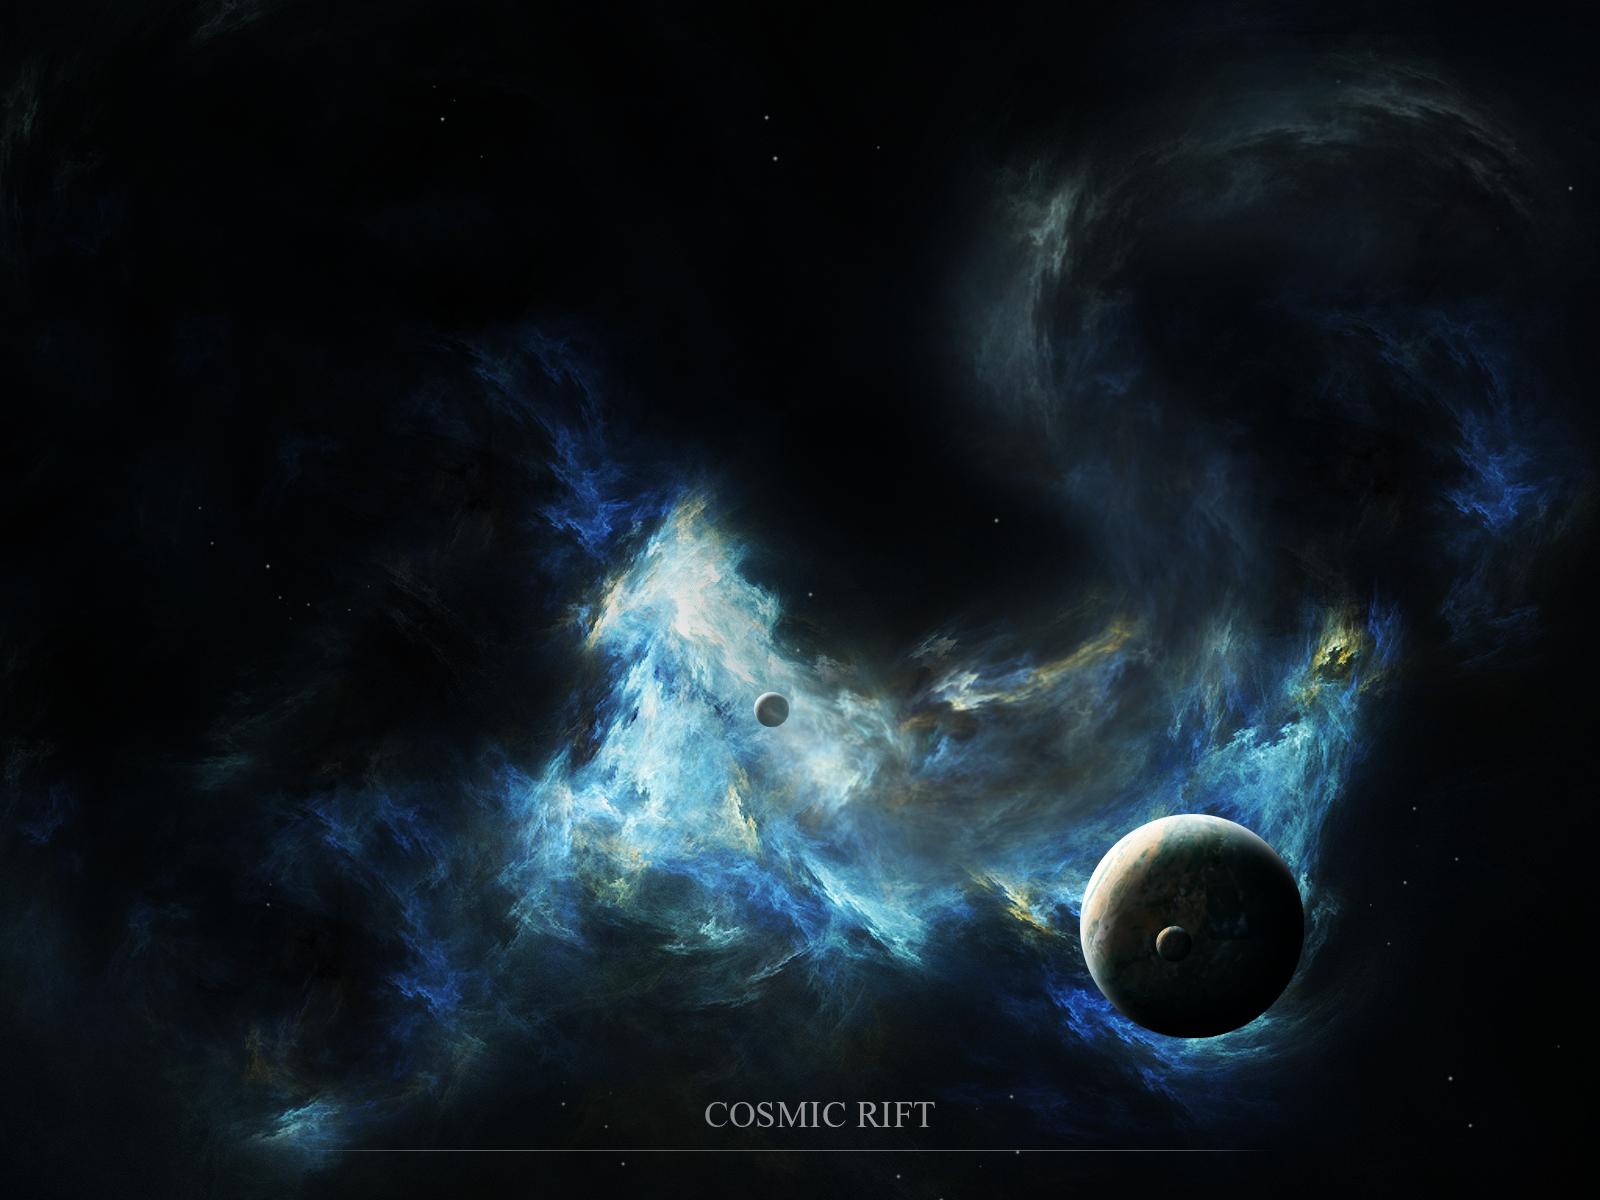 Cosmic Rift by jadenxtrinityx